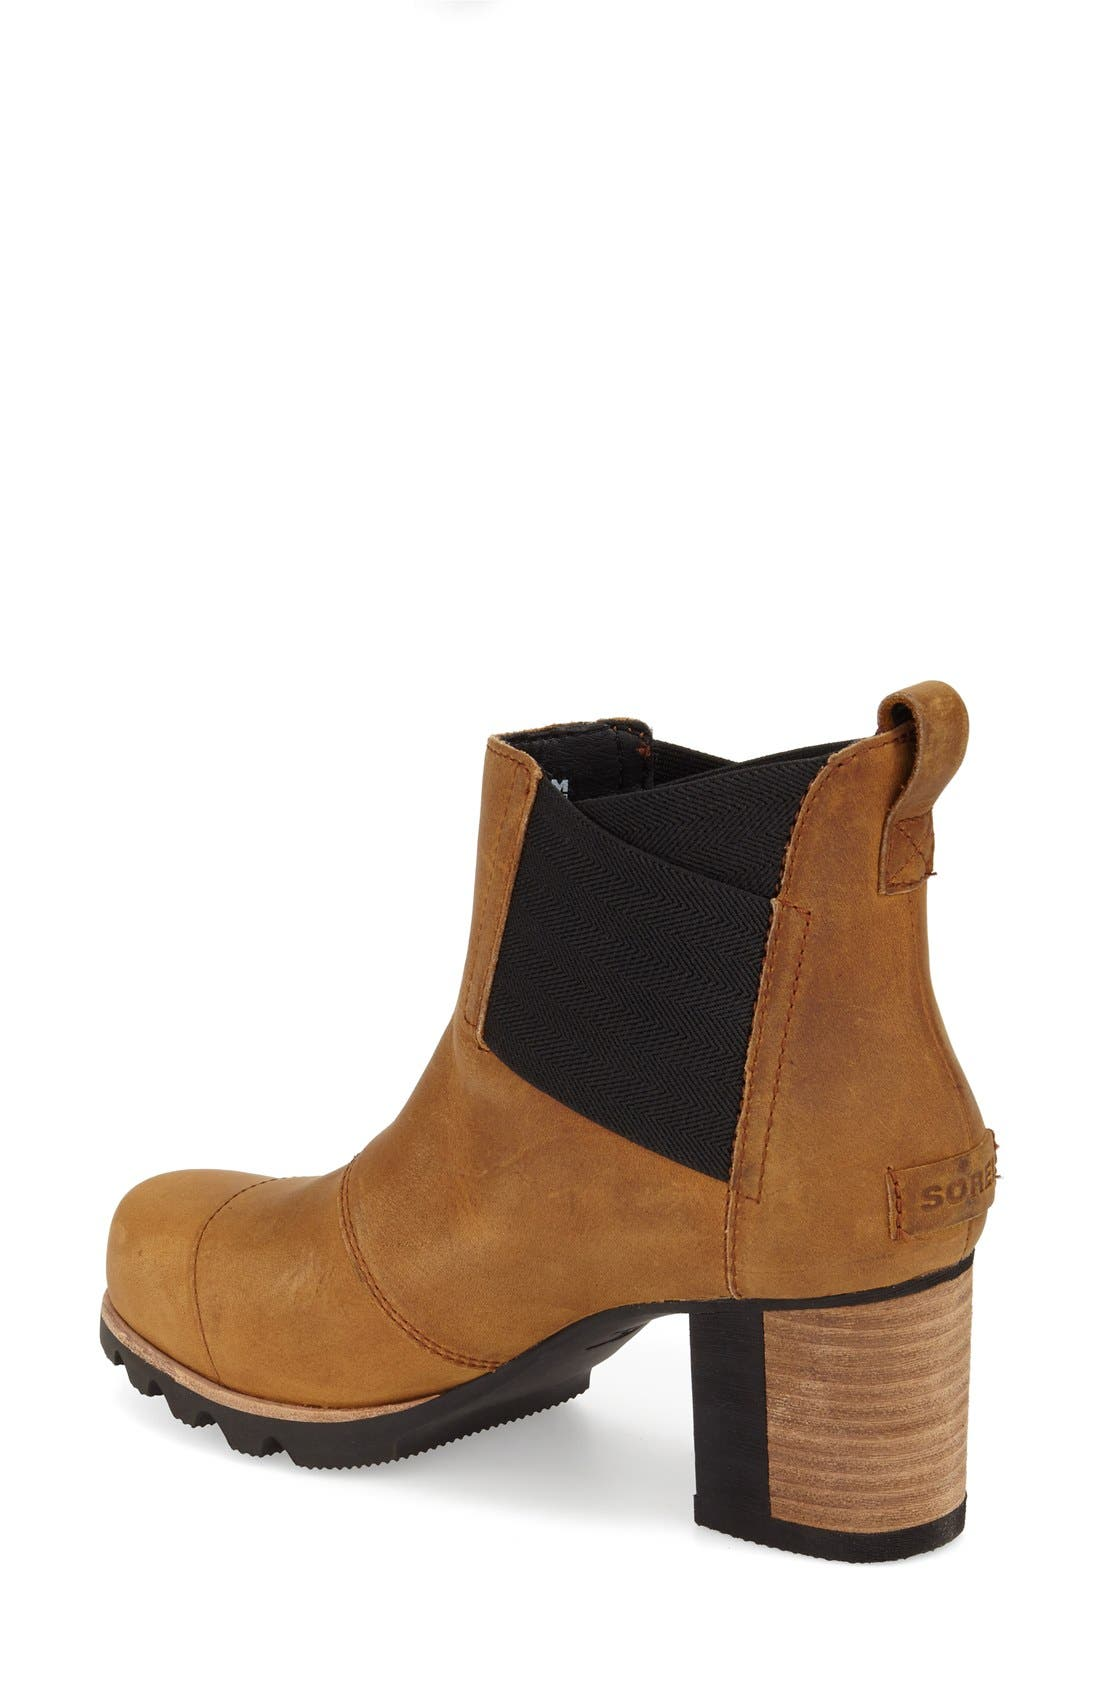 'Addington' Waterproof Chelsea Boot,                             Alternate thumbnail 2, color,                             Autumn Bronze